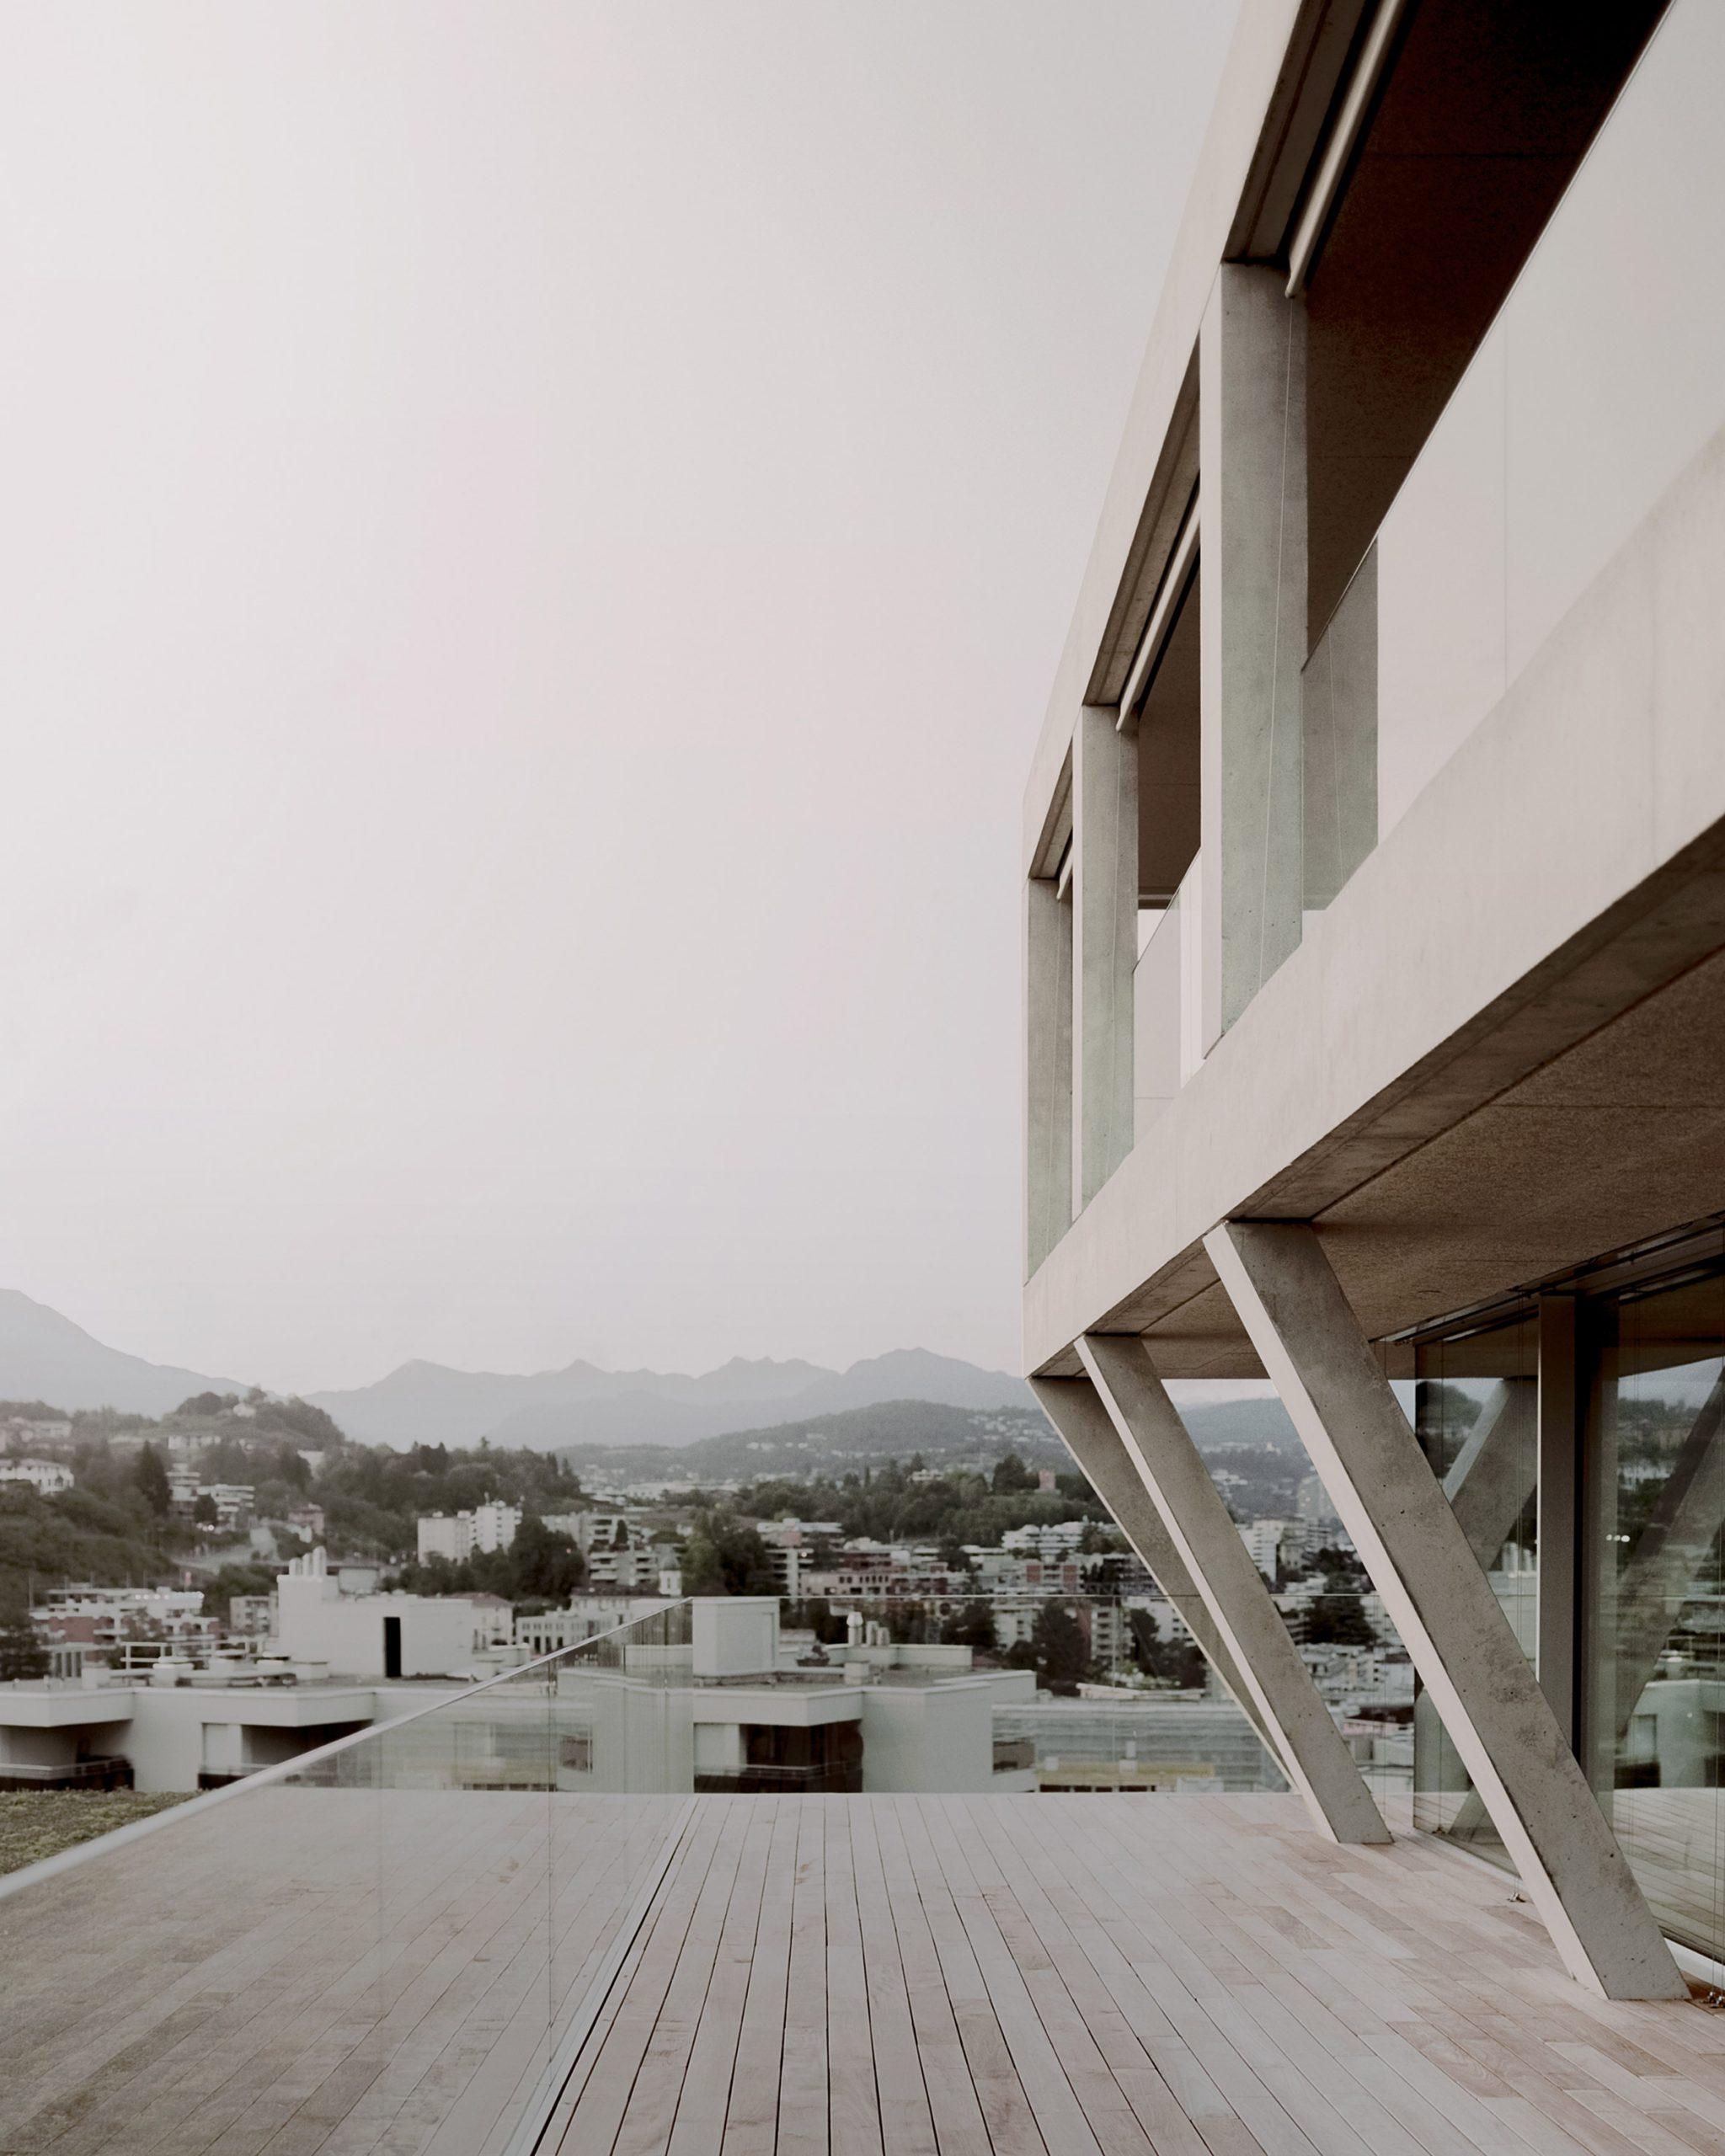 The building has a concrete exterior by DF_DC